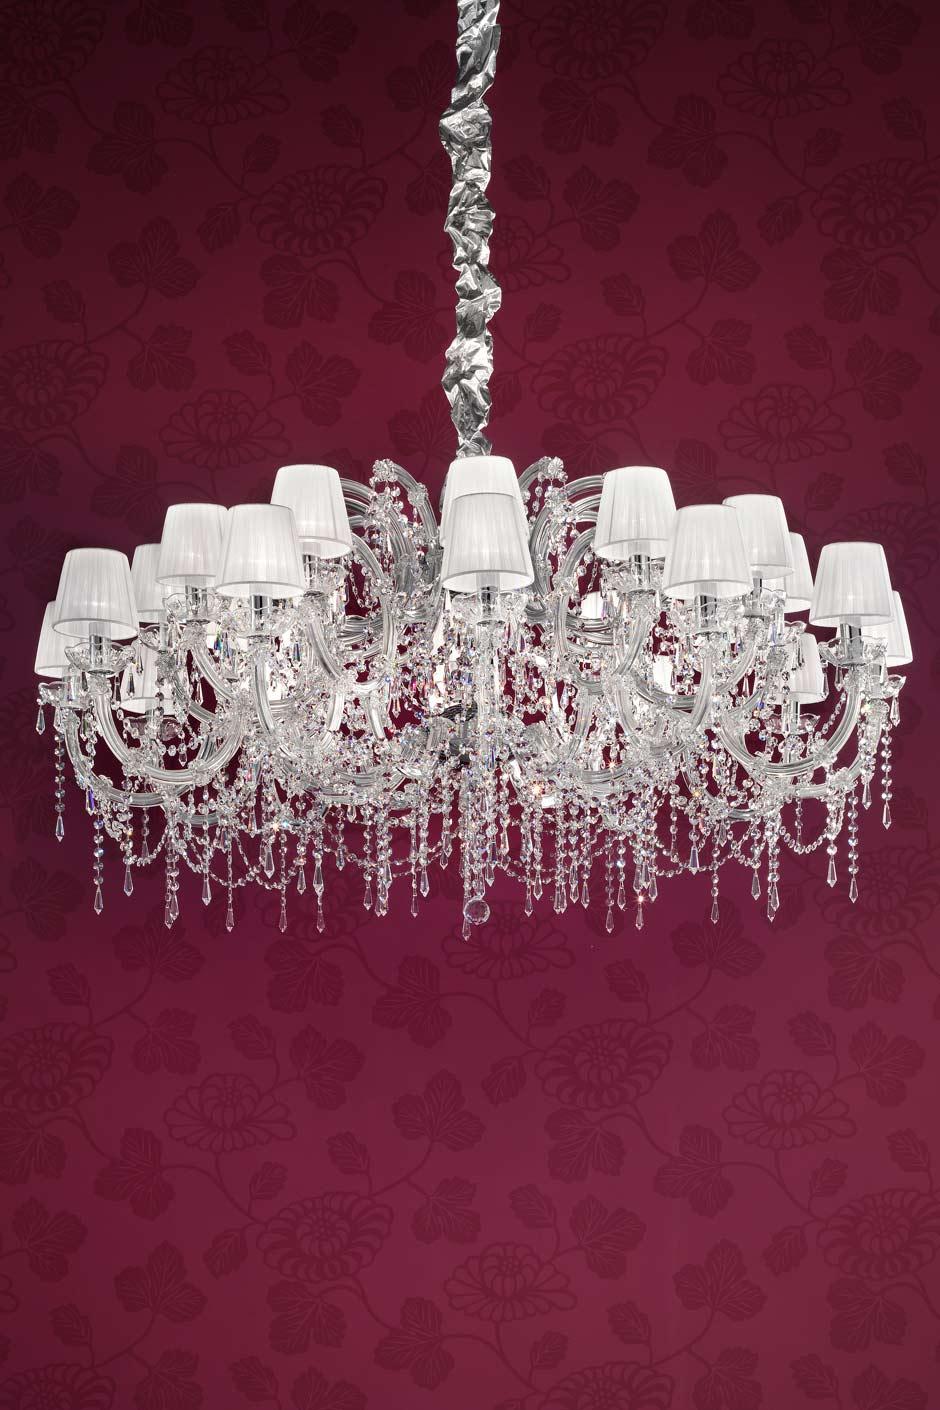 lustre cristal design blanc transparent et m tal chrom masiero sp cialiste du lustre en. Black Bedroom Furniture Sets. Home Design Ideas